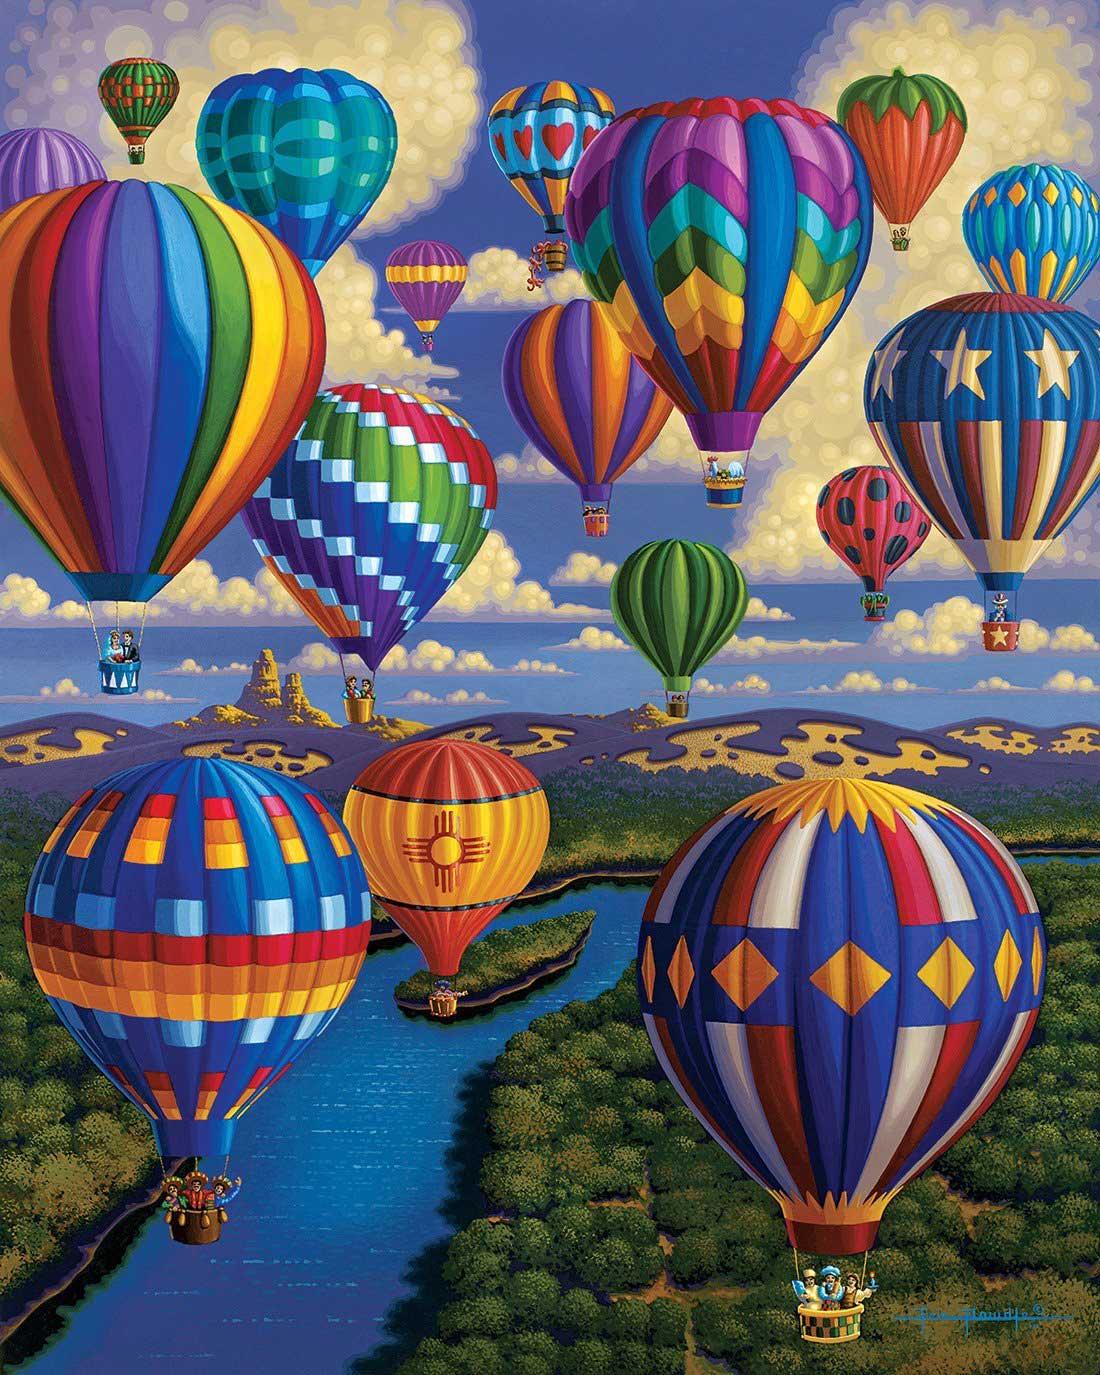 Balloon Festival Summer Jigsaw Puzzle